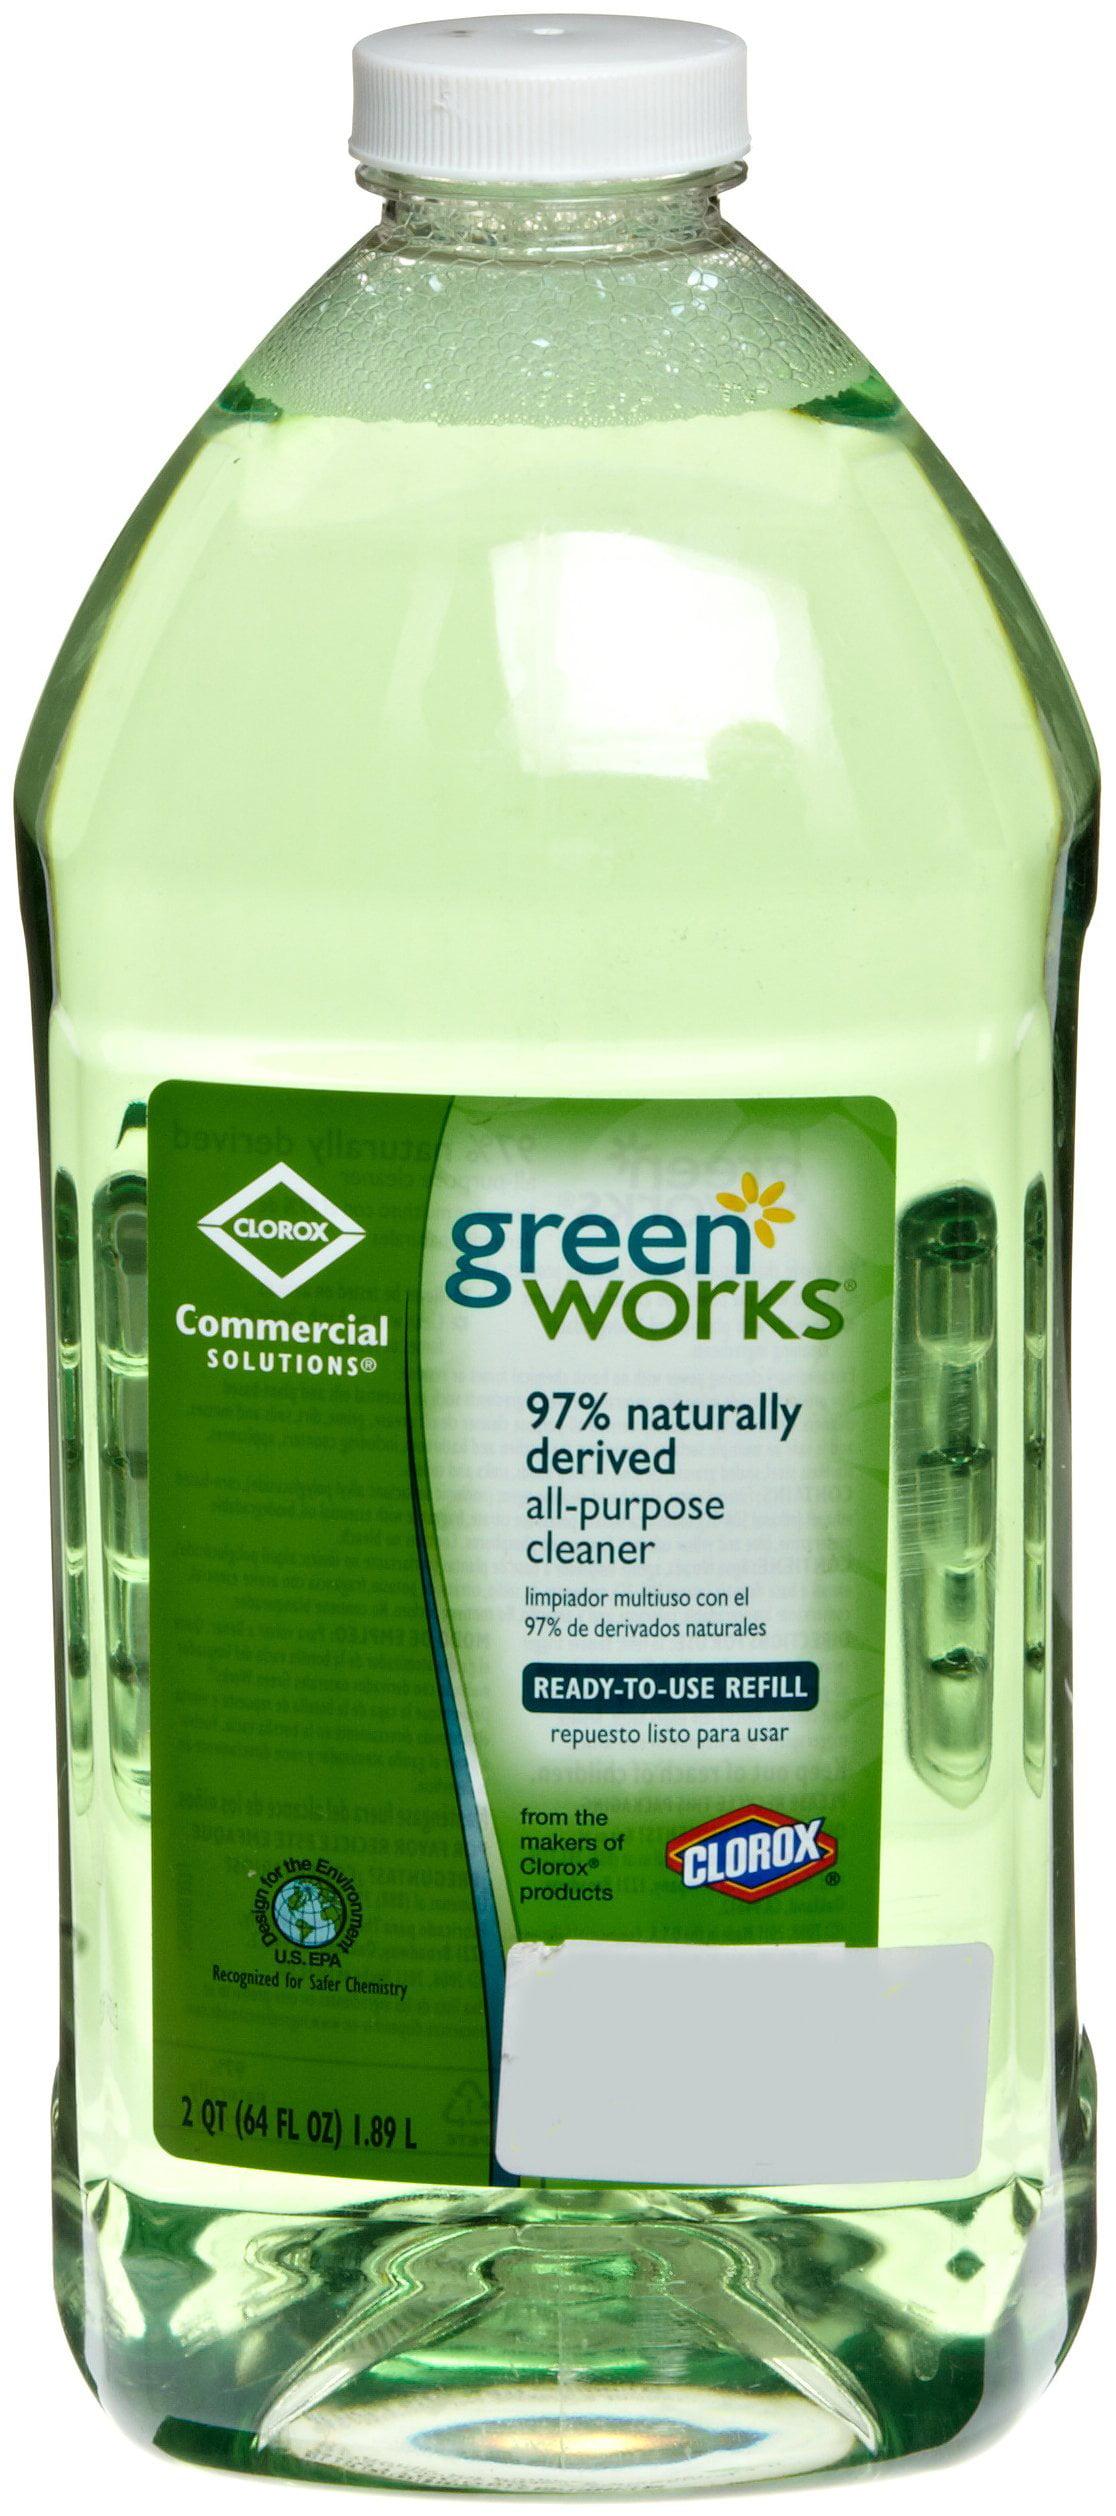 Worksheet 64 Fl Oz To Quarts green works all purpose cleaner liquid solution 64 fl oz 2 by clorox